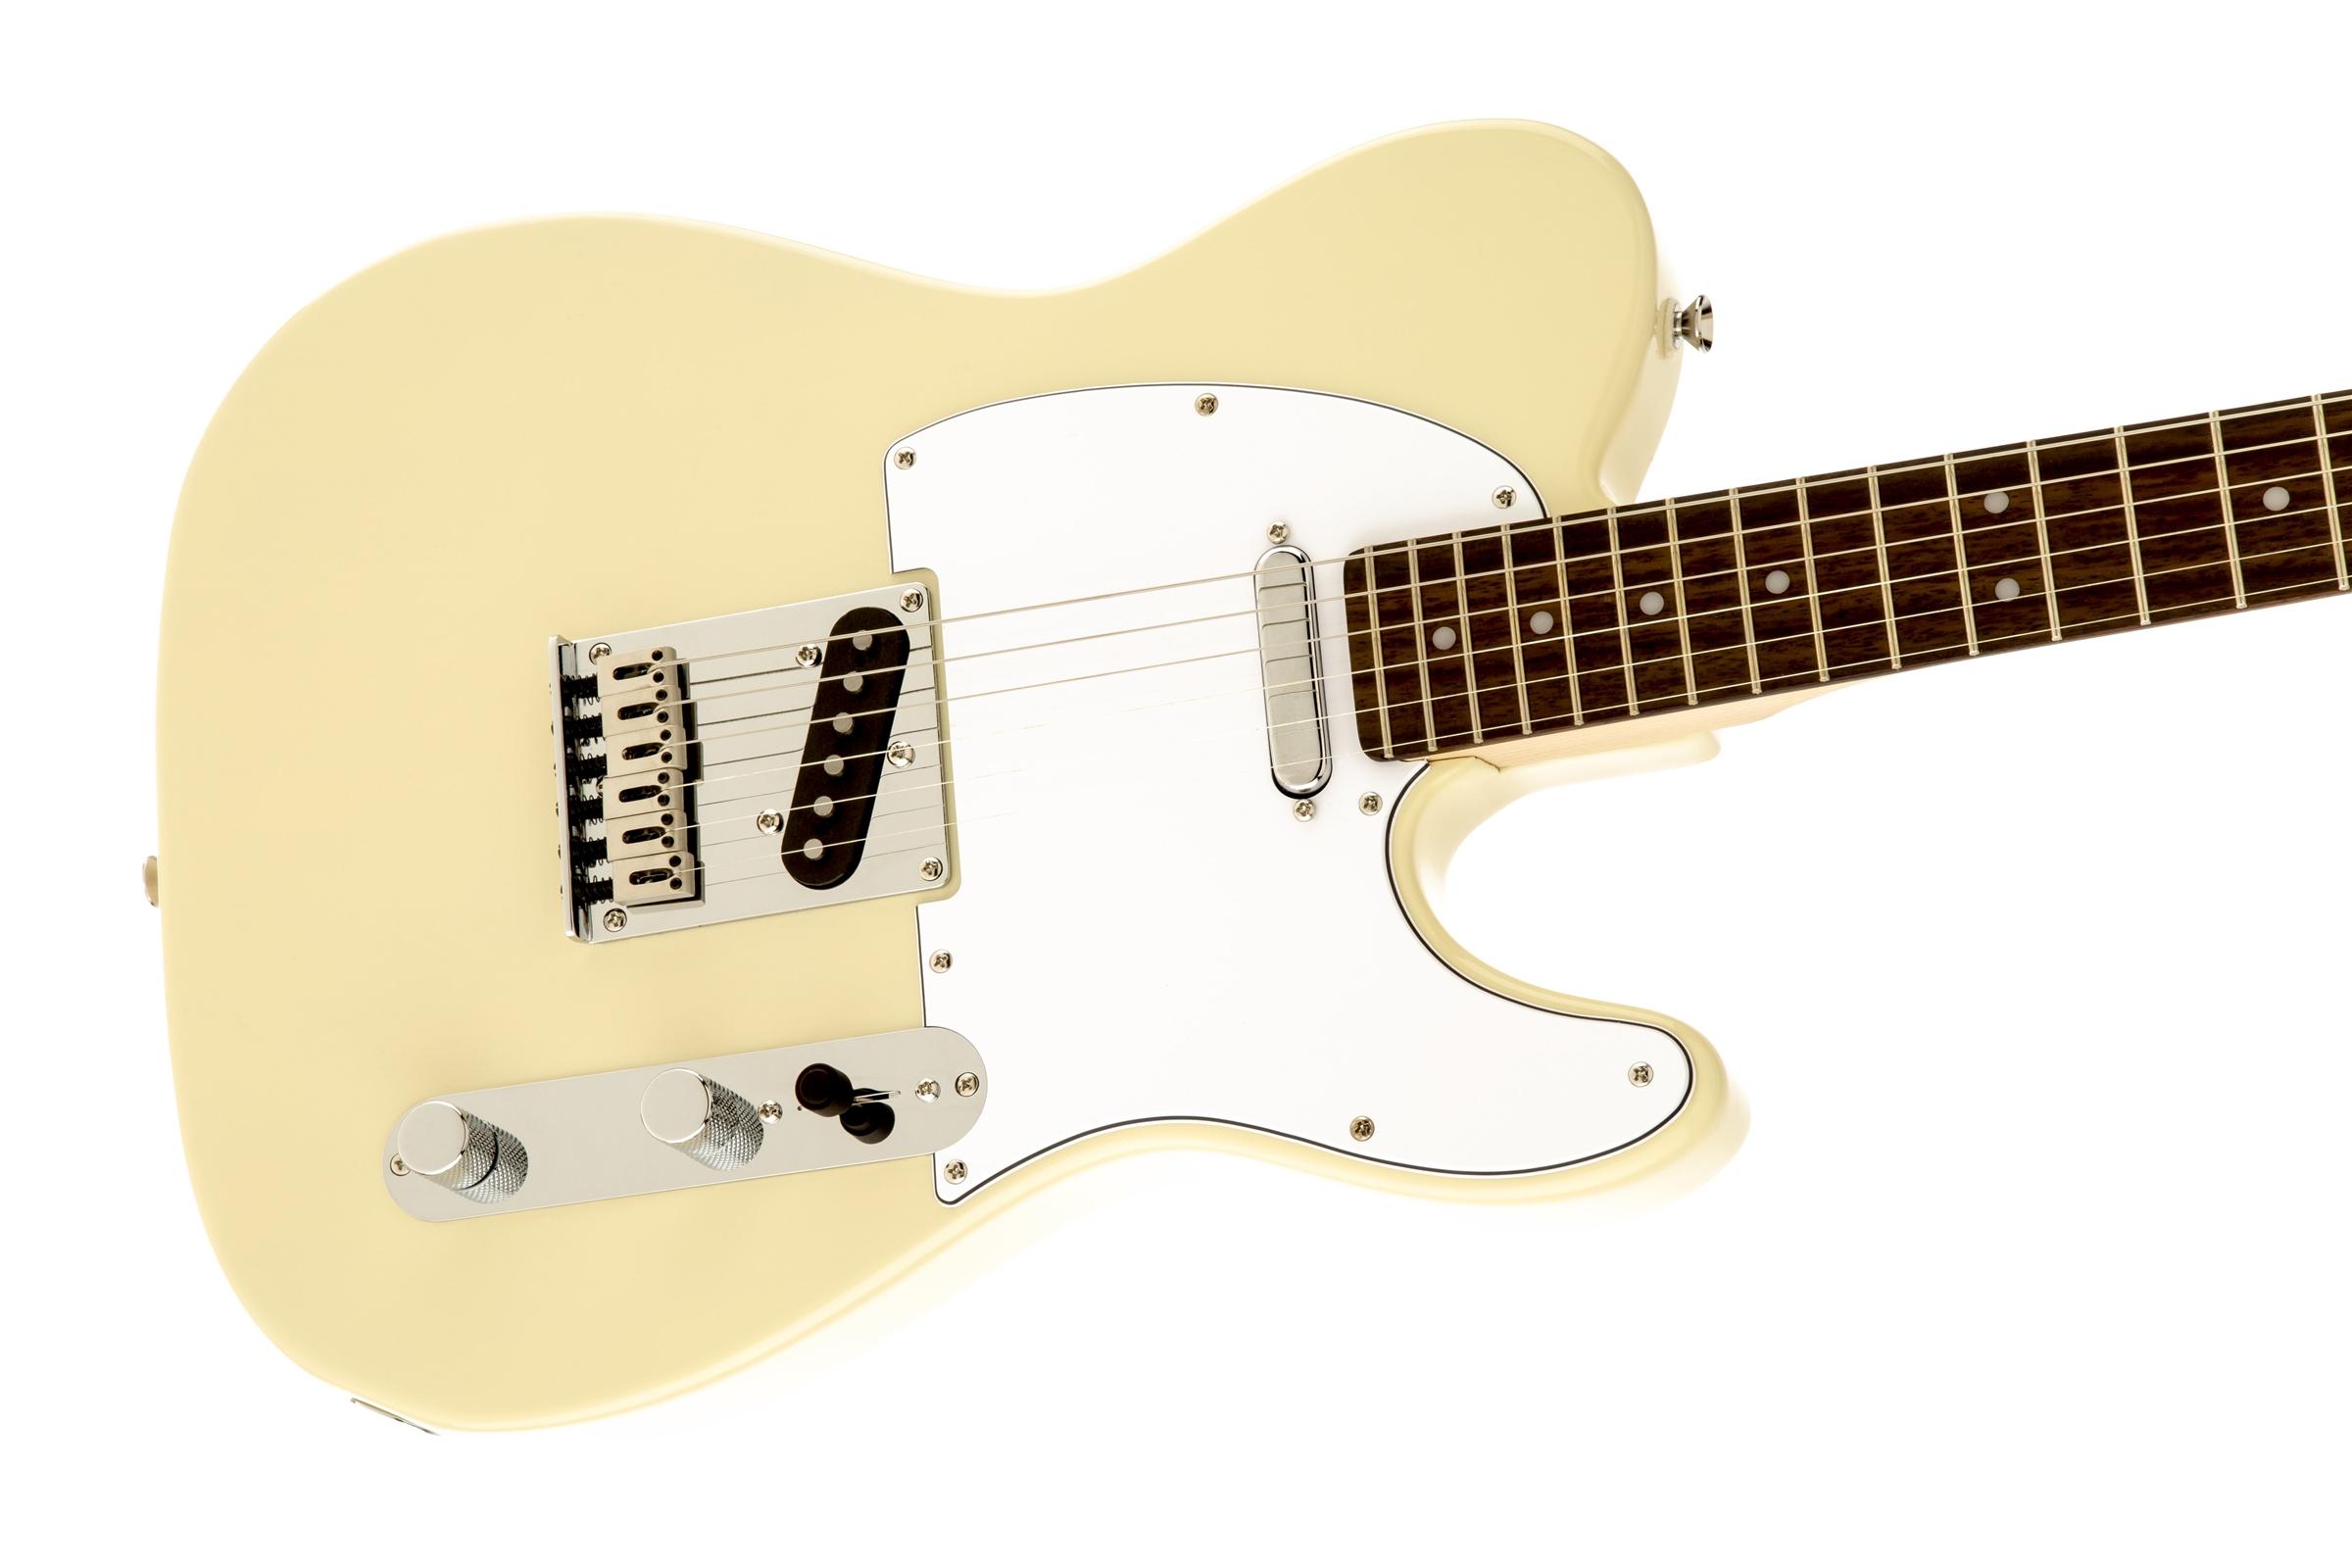 Squier Rental From 7 Month Musicorp Australia Fender Standard Stratocaster